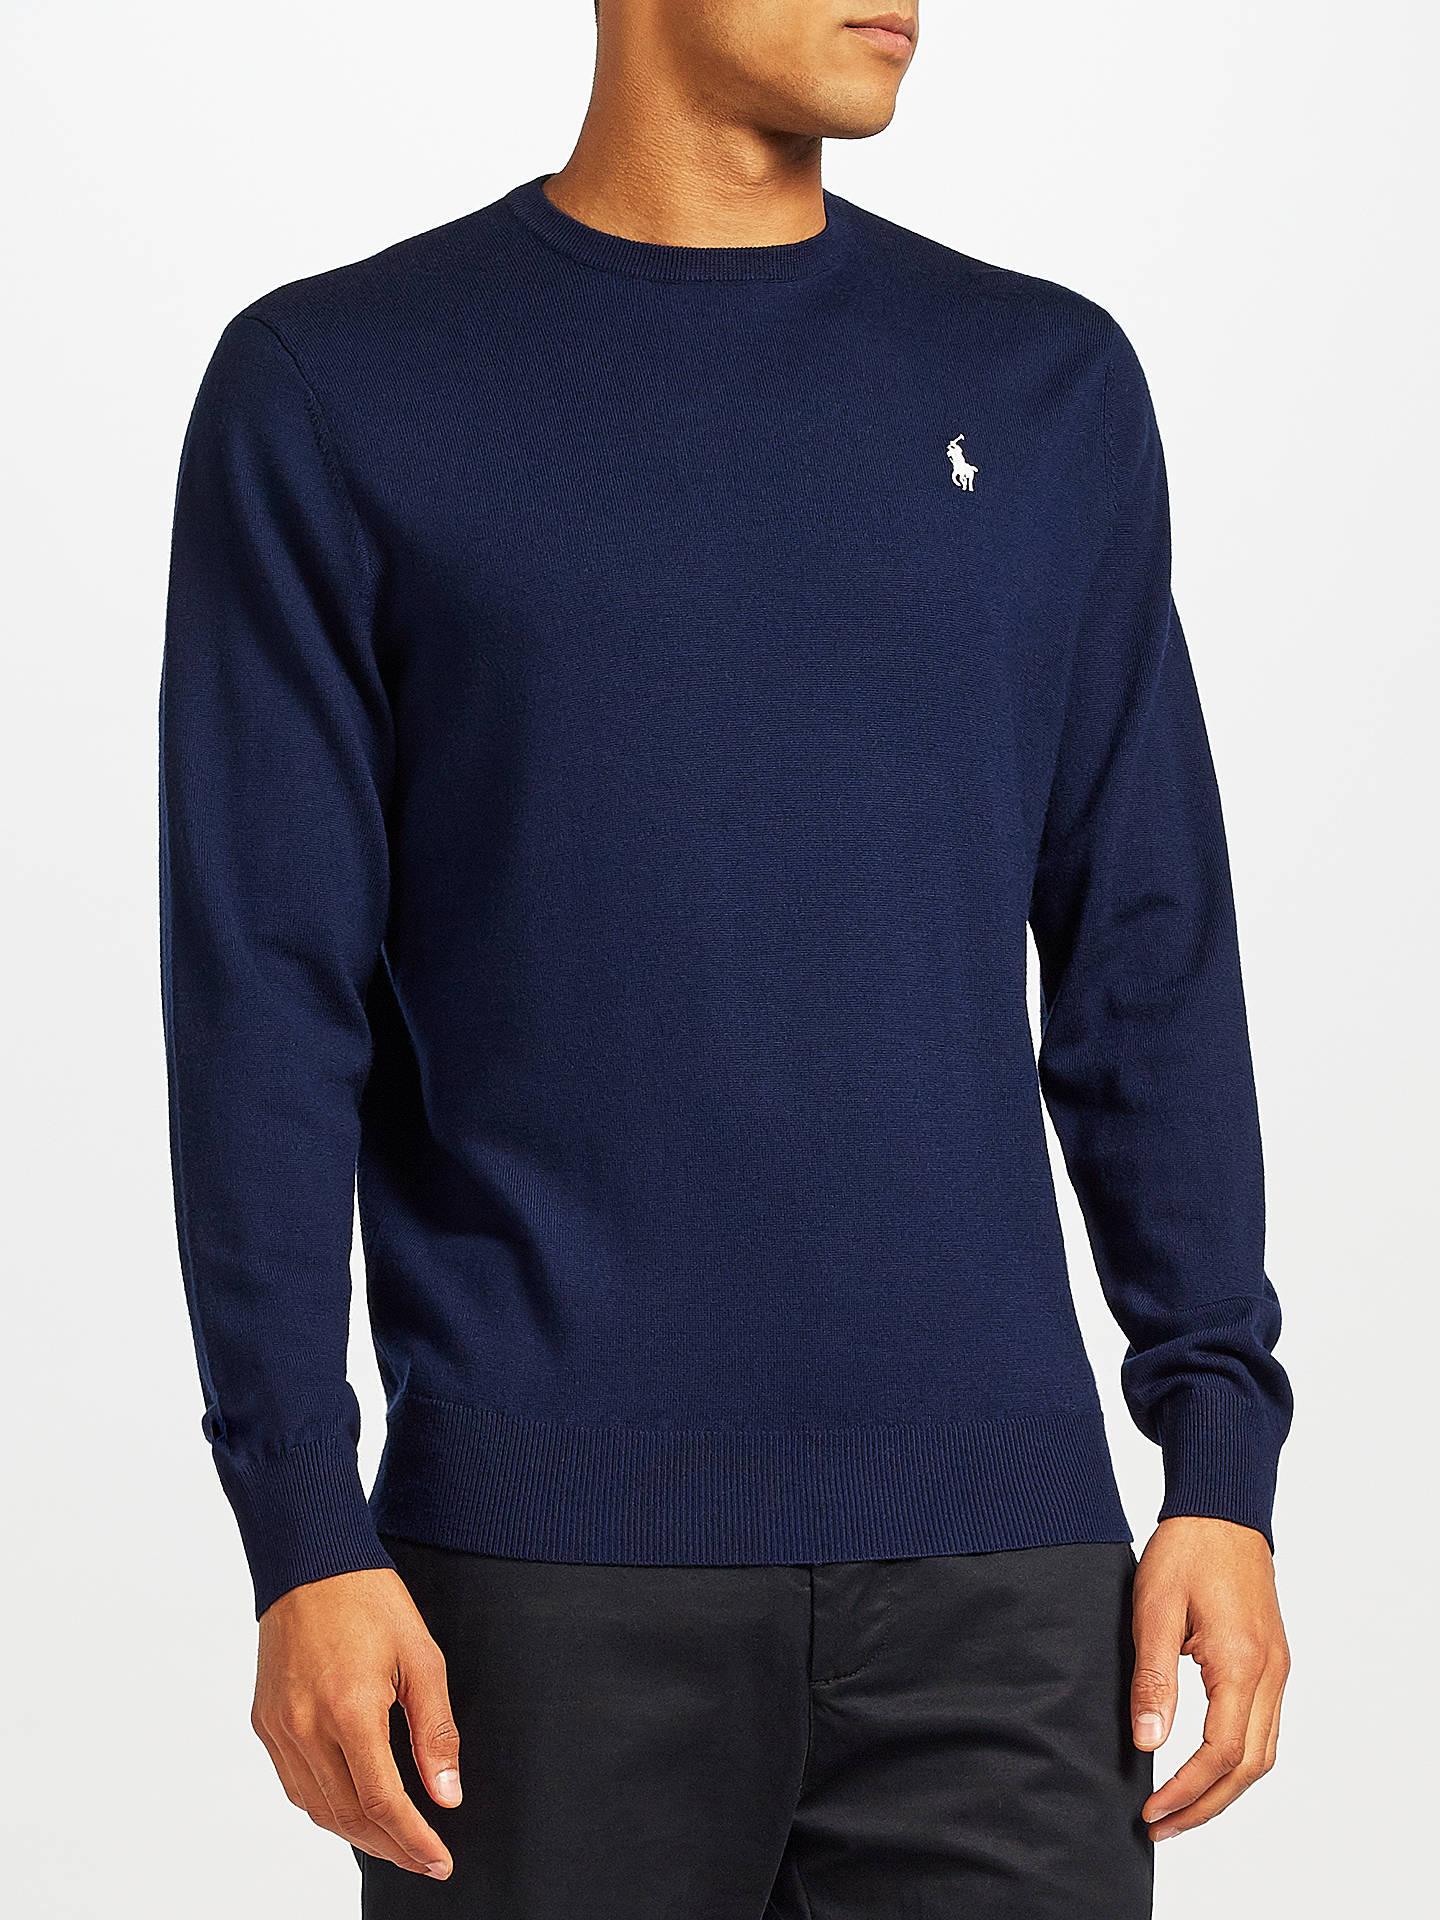 1d2f965ef631 Polo Ralph Lauren Long Sleeve Crew Merino Wool Knitted Jumper at ...